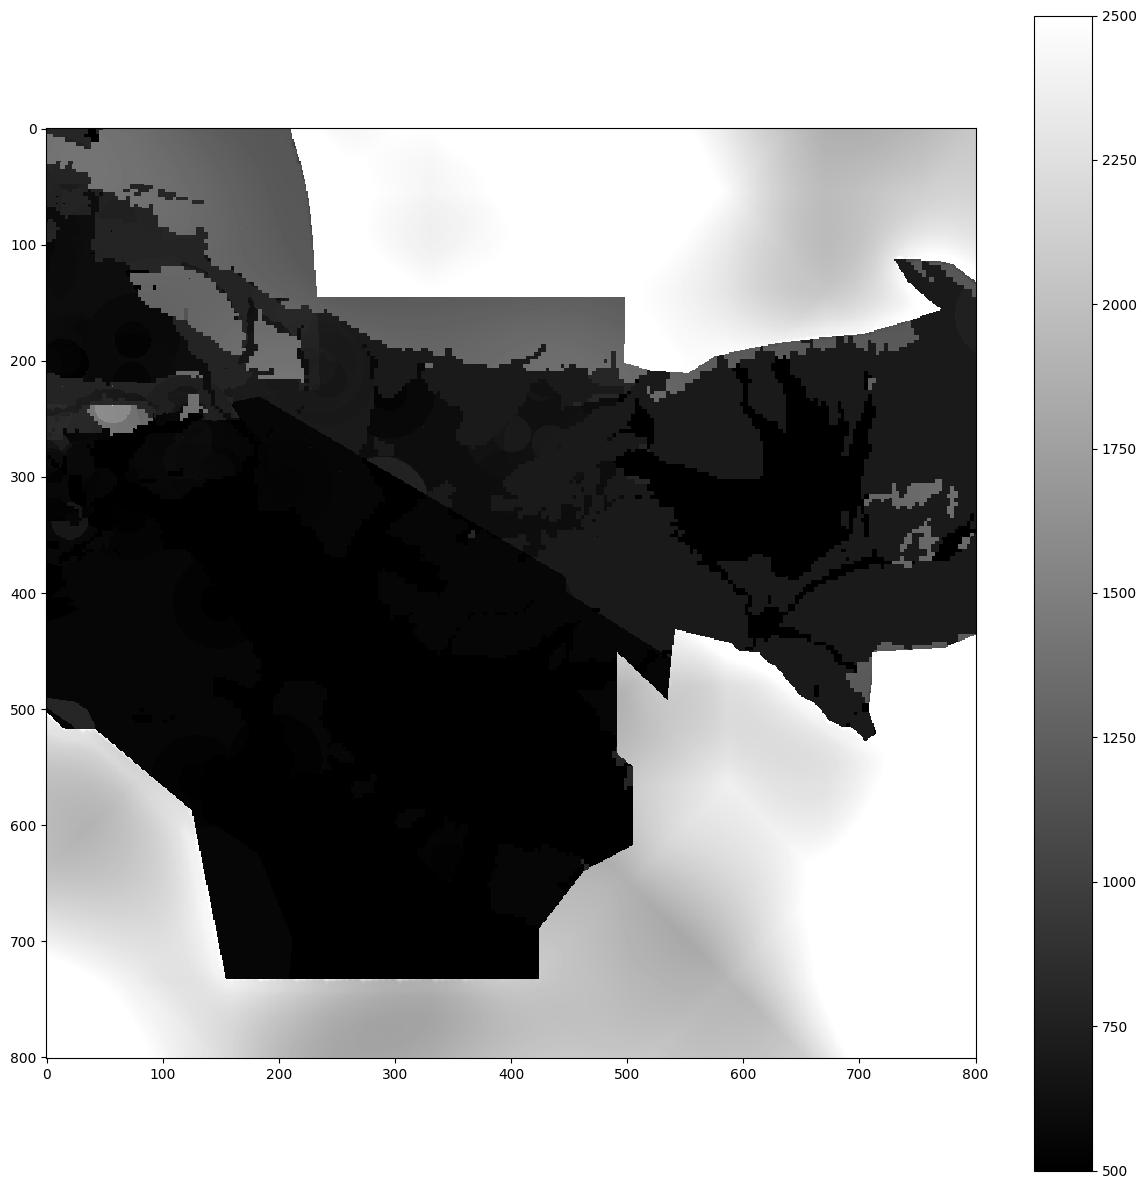 bench/seismic/wp/la_habra/meshes/velocity_model/plots/vs_50.png